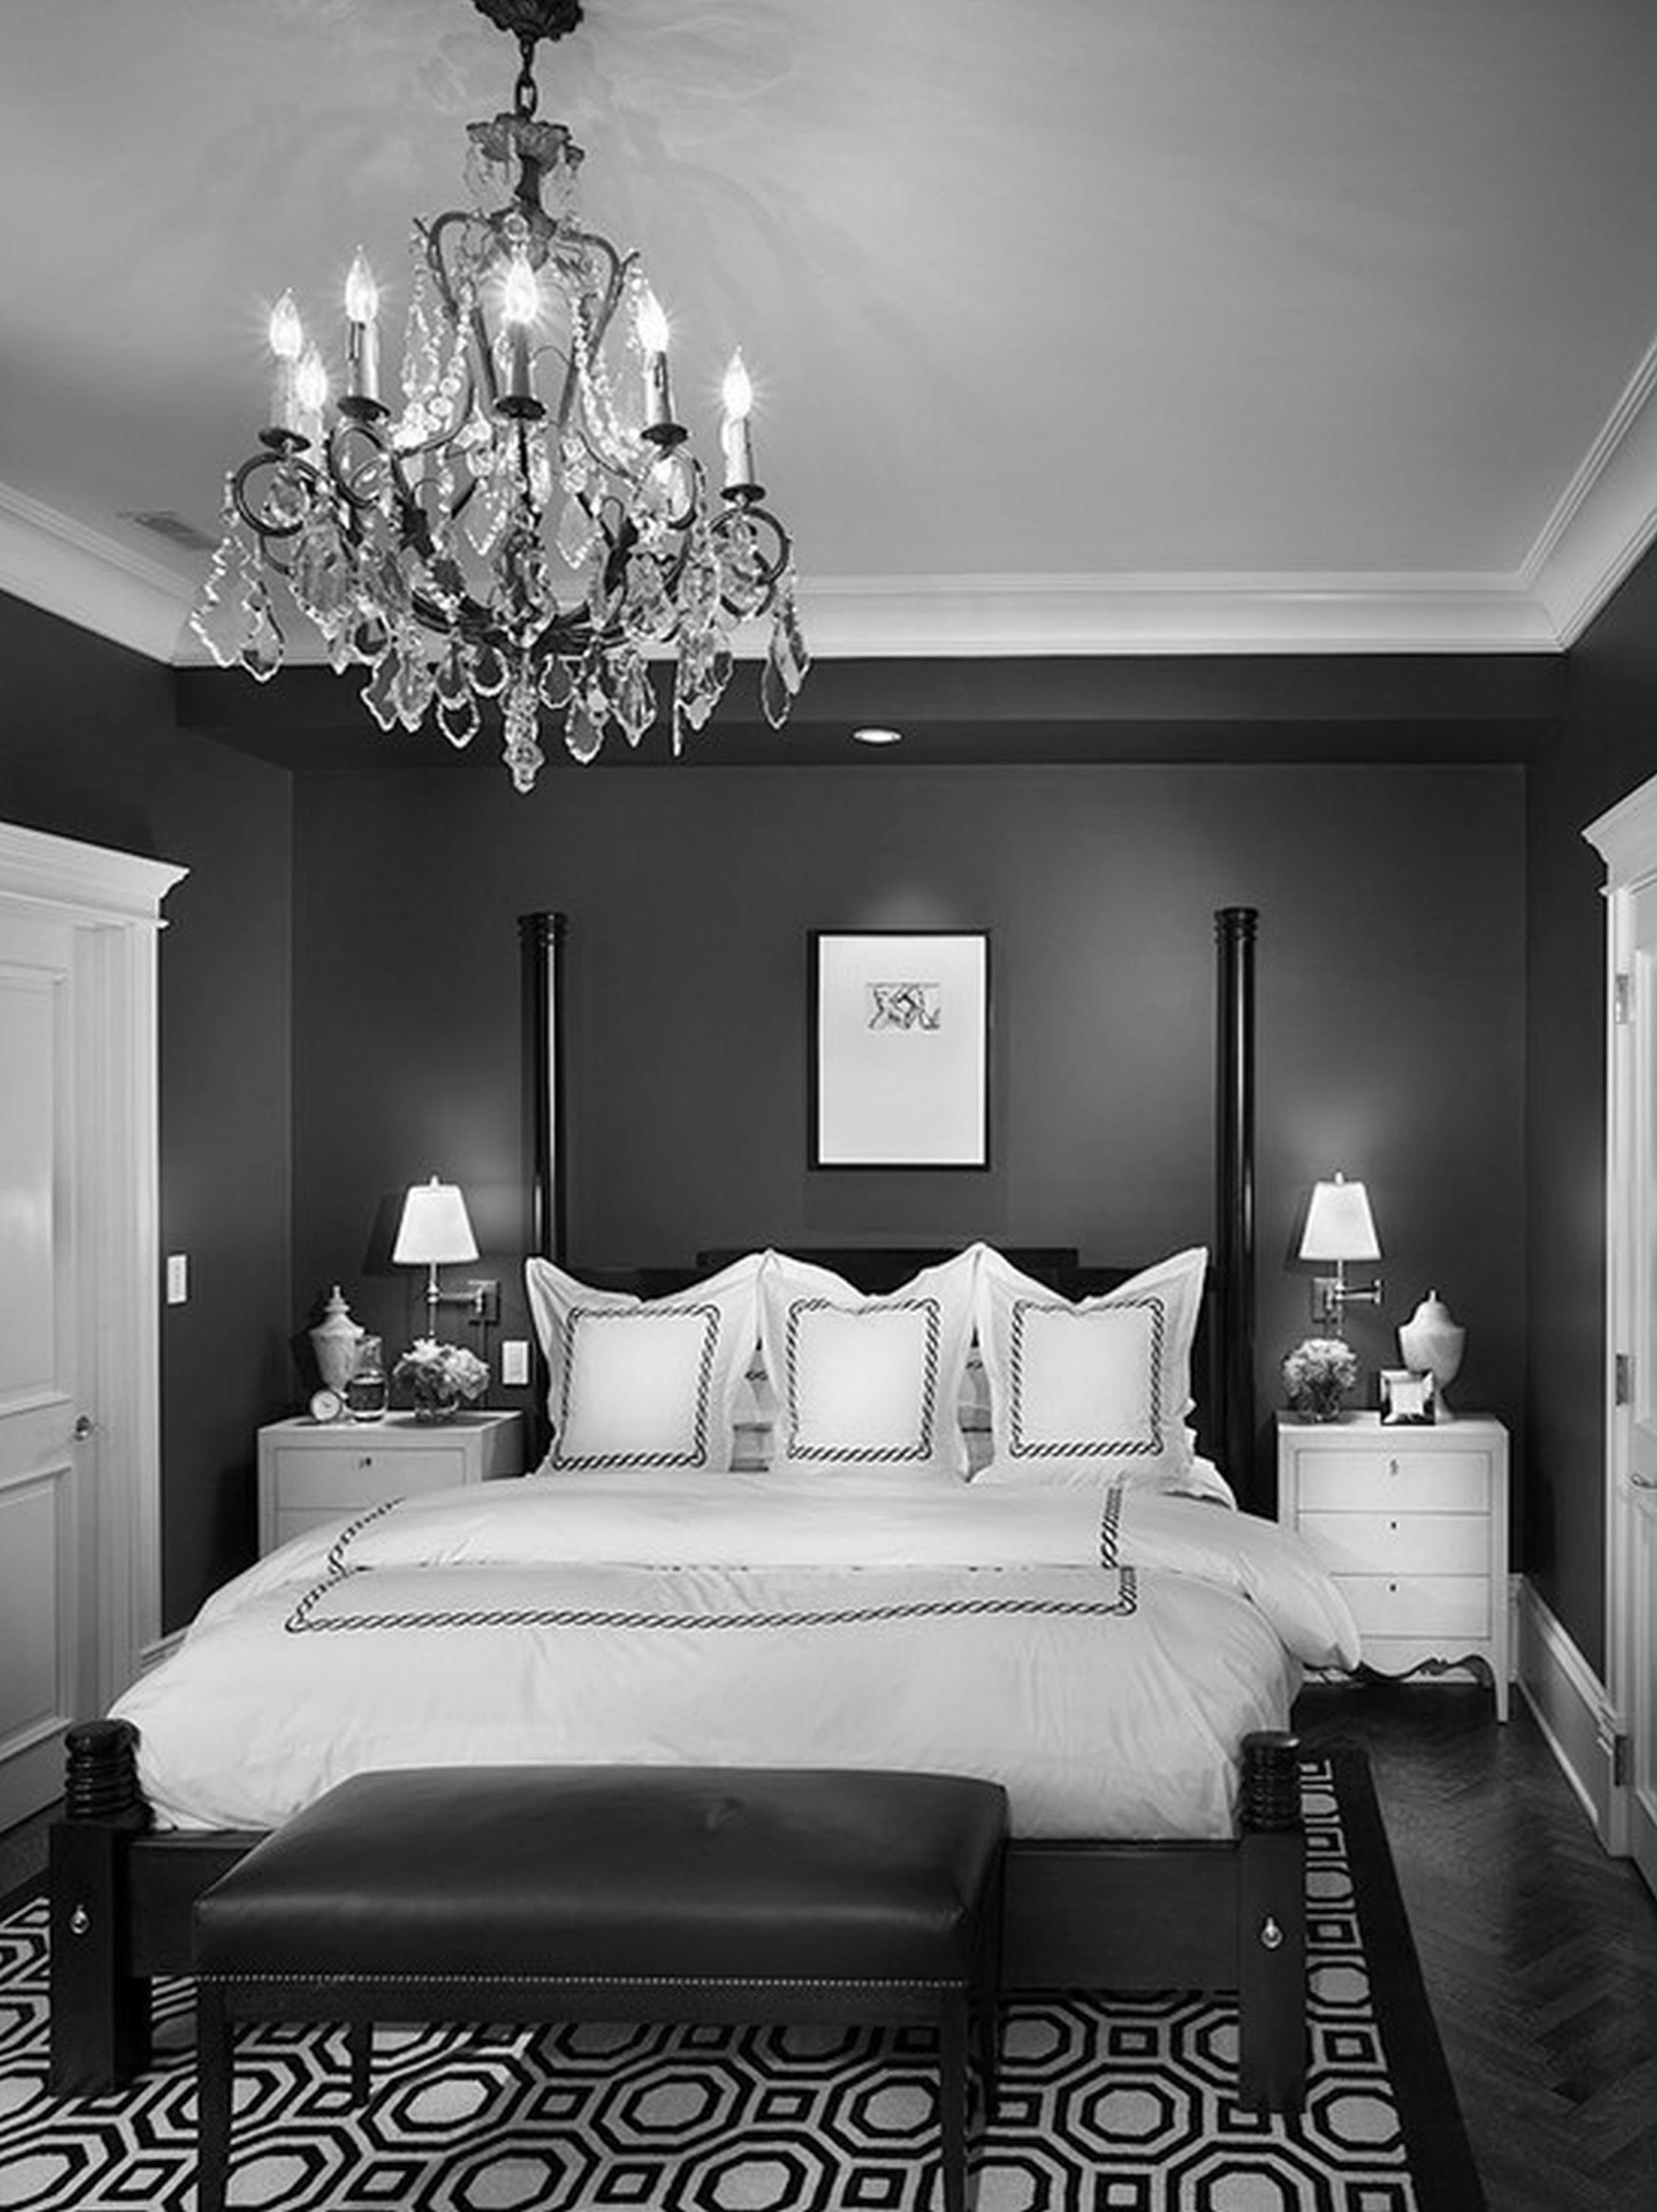 Latest Chandeliers : Black Chandelier For Bedroom Best Of Mini Chandeliers Throughout Black Chandelier Bedroom (View 7 of 15)